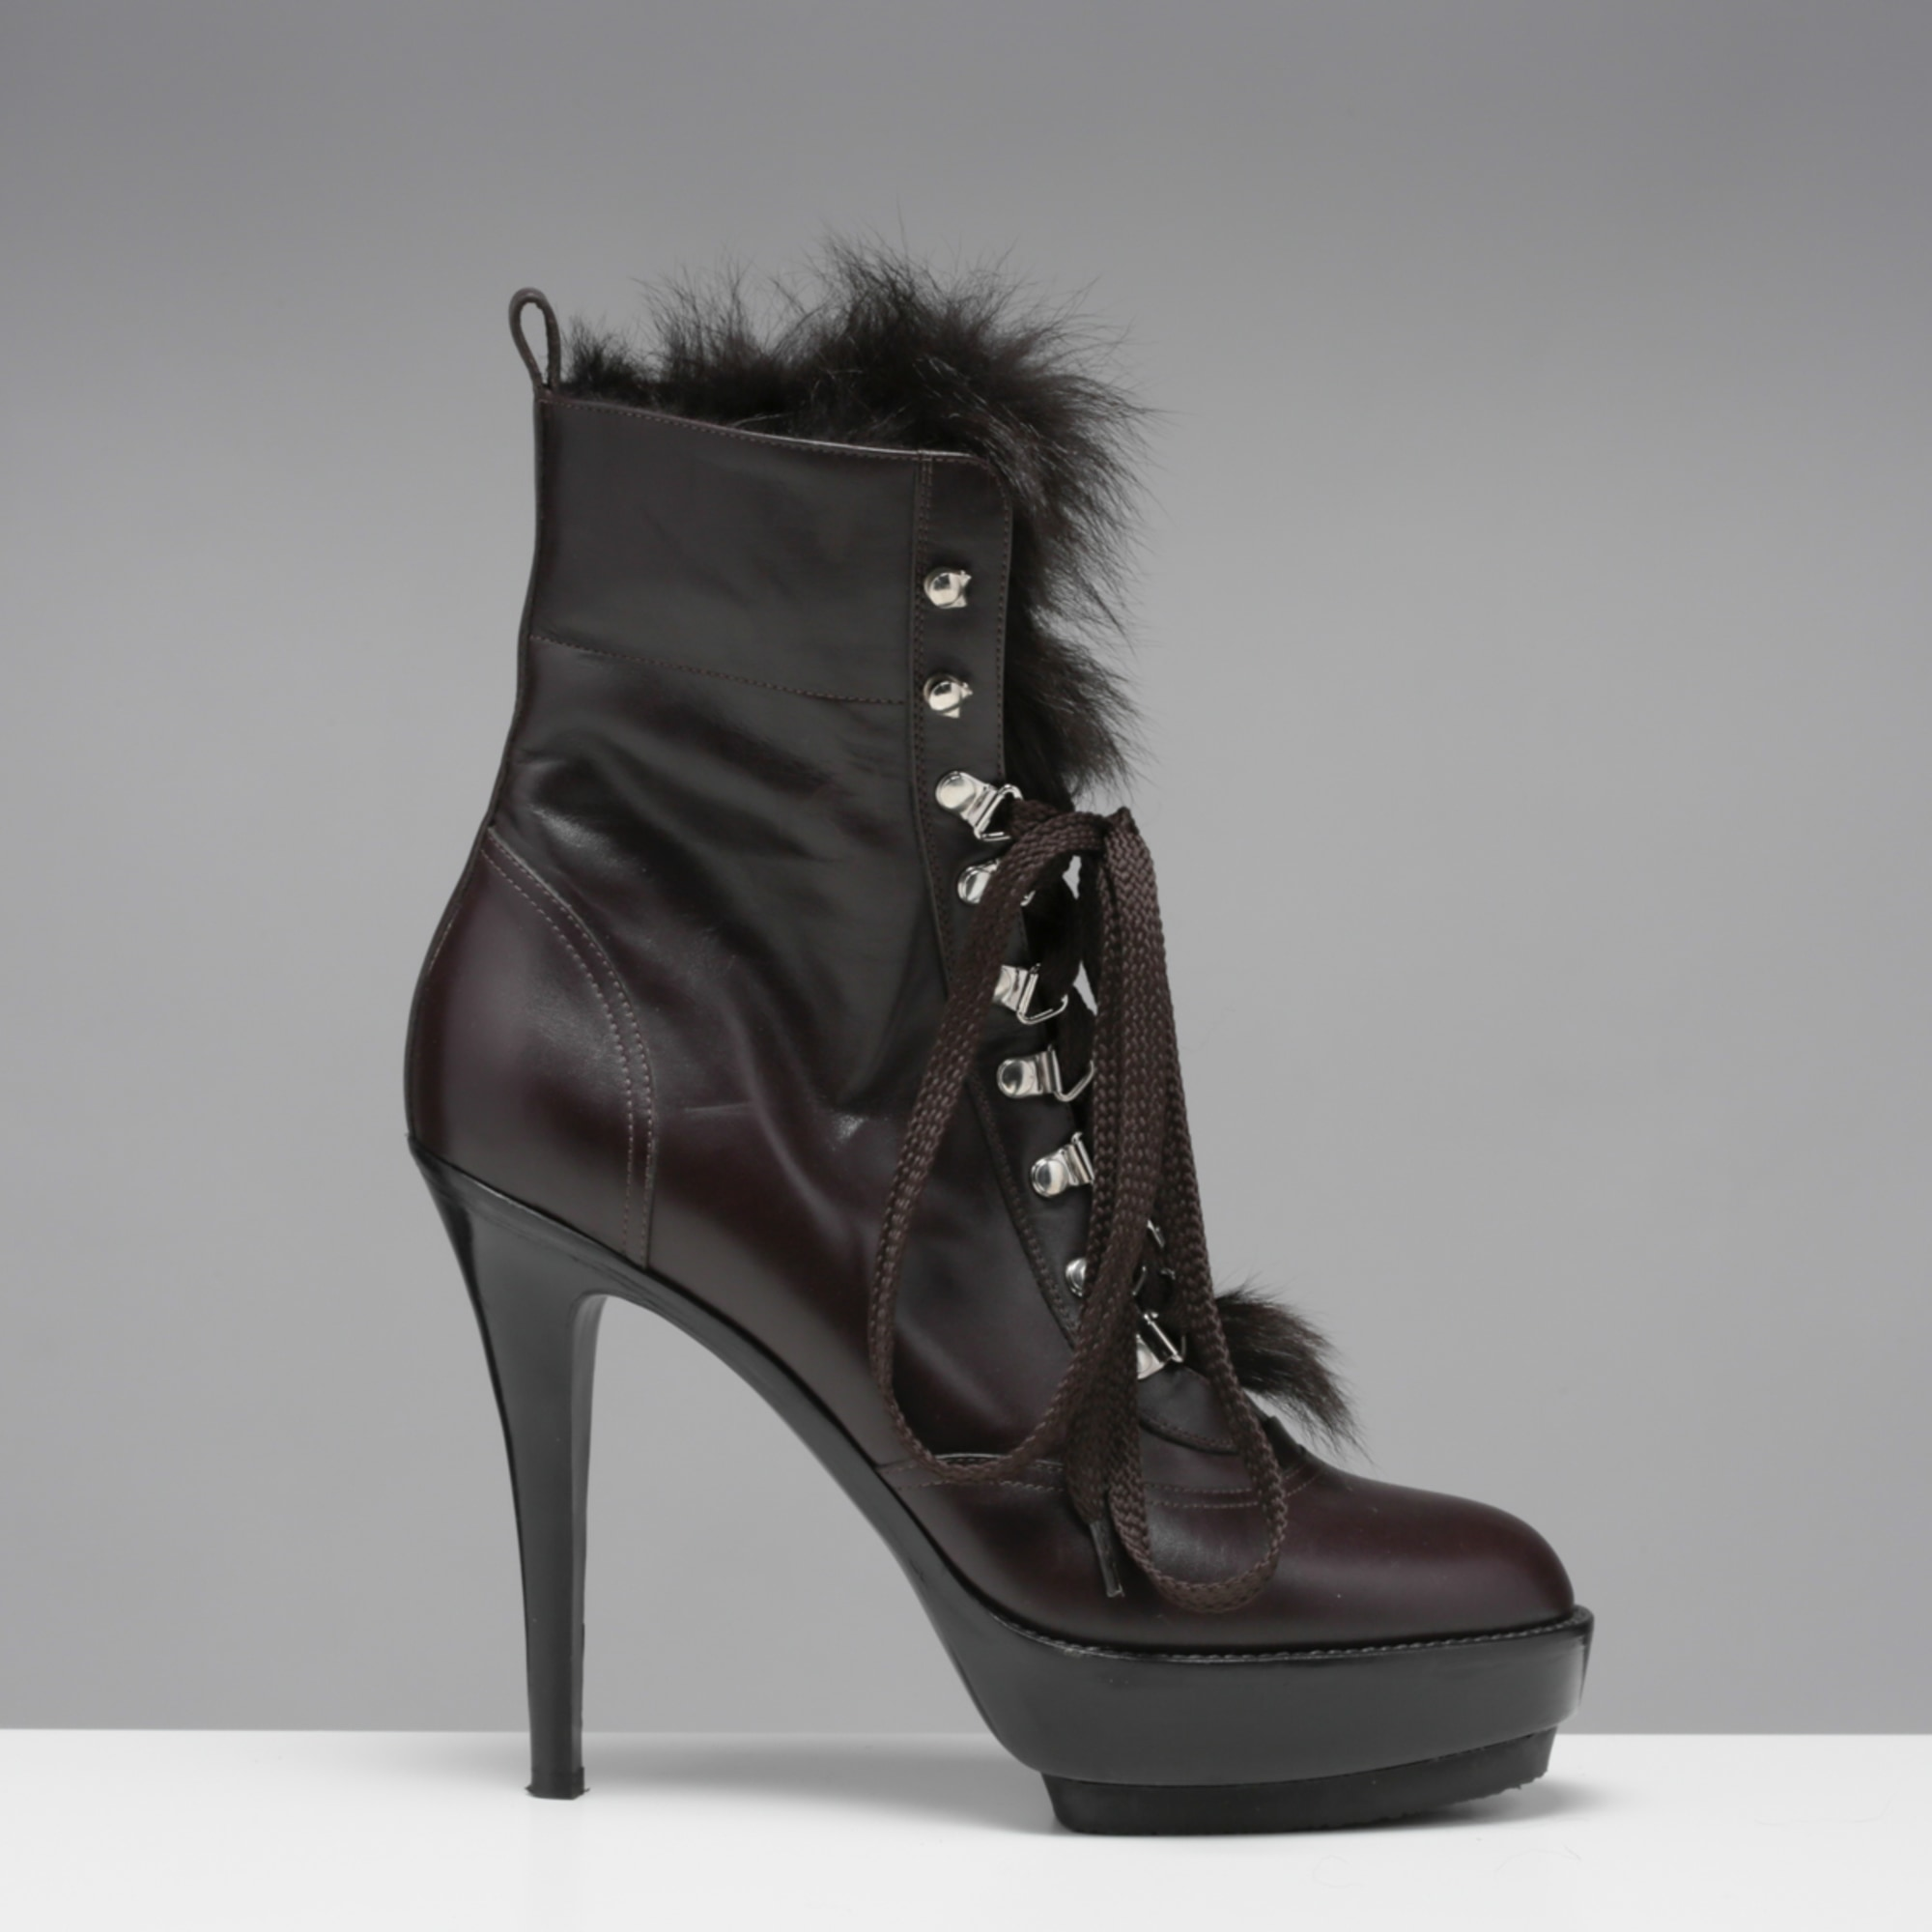 Bottines & low boots à talons GIANVITO ROSSI Marron